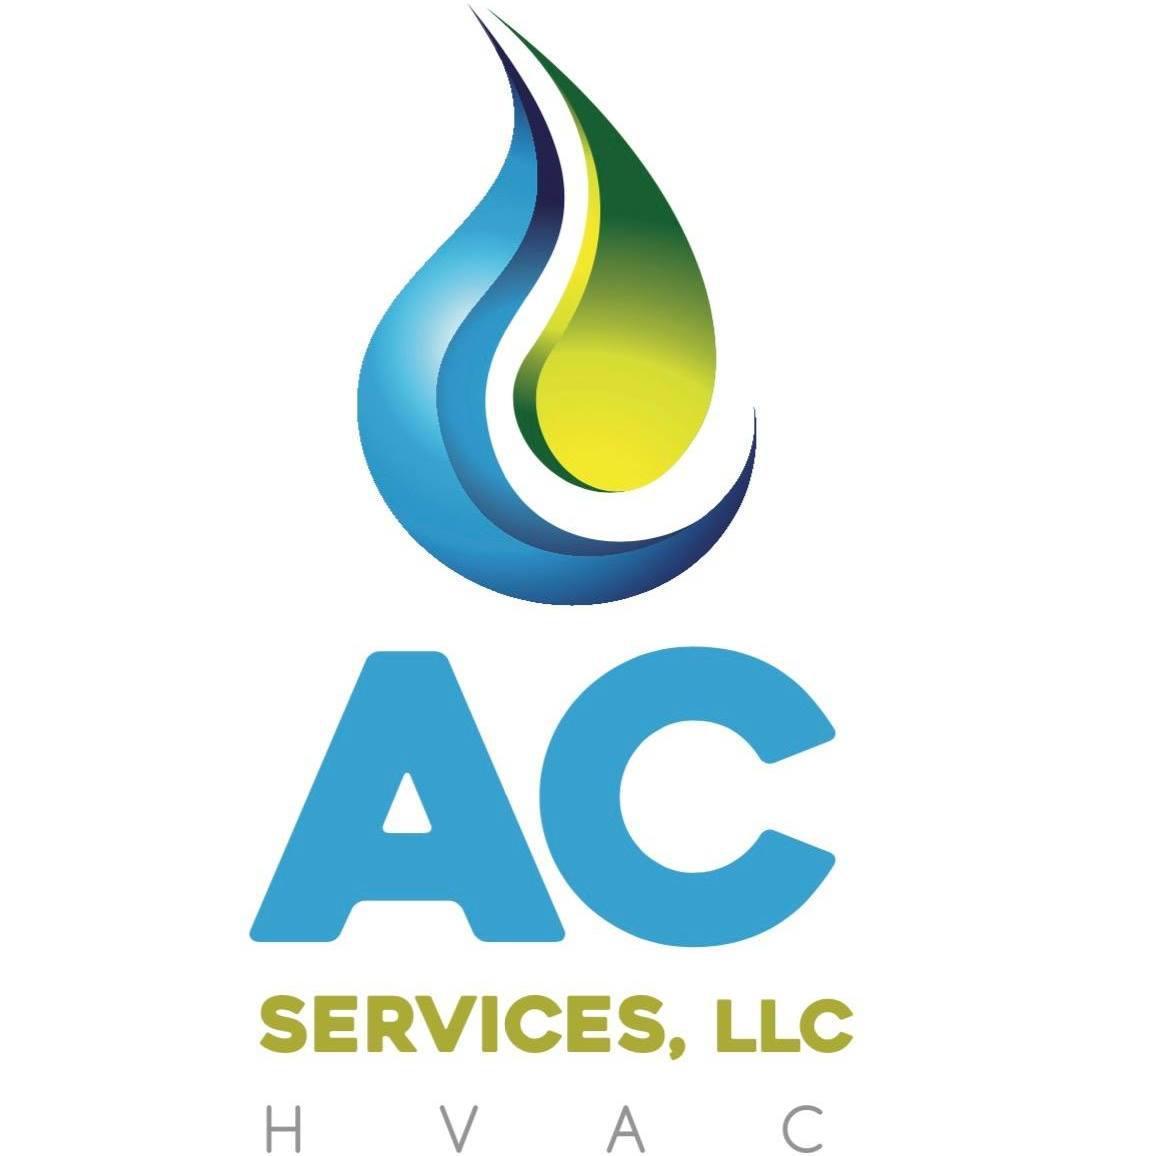 AC Services, LLC image 1